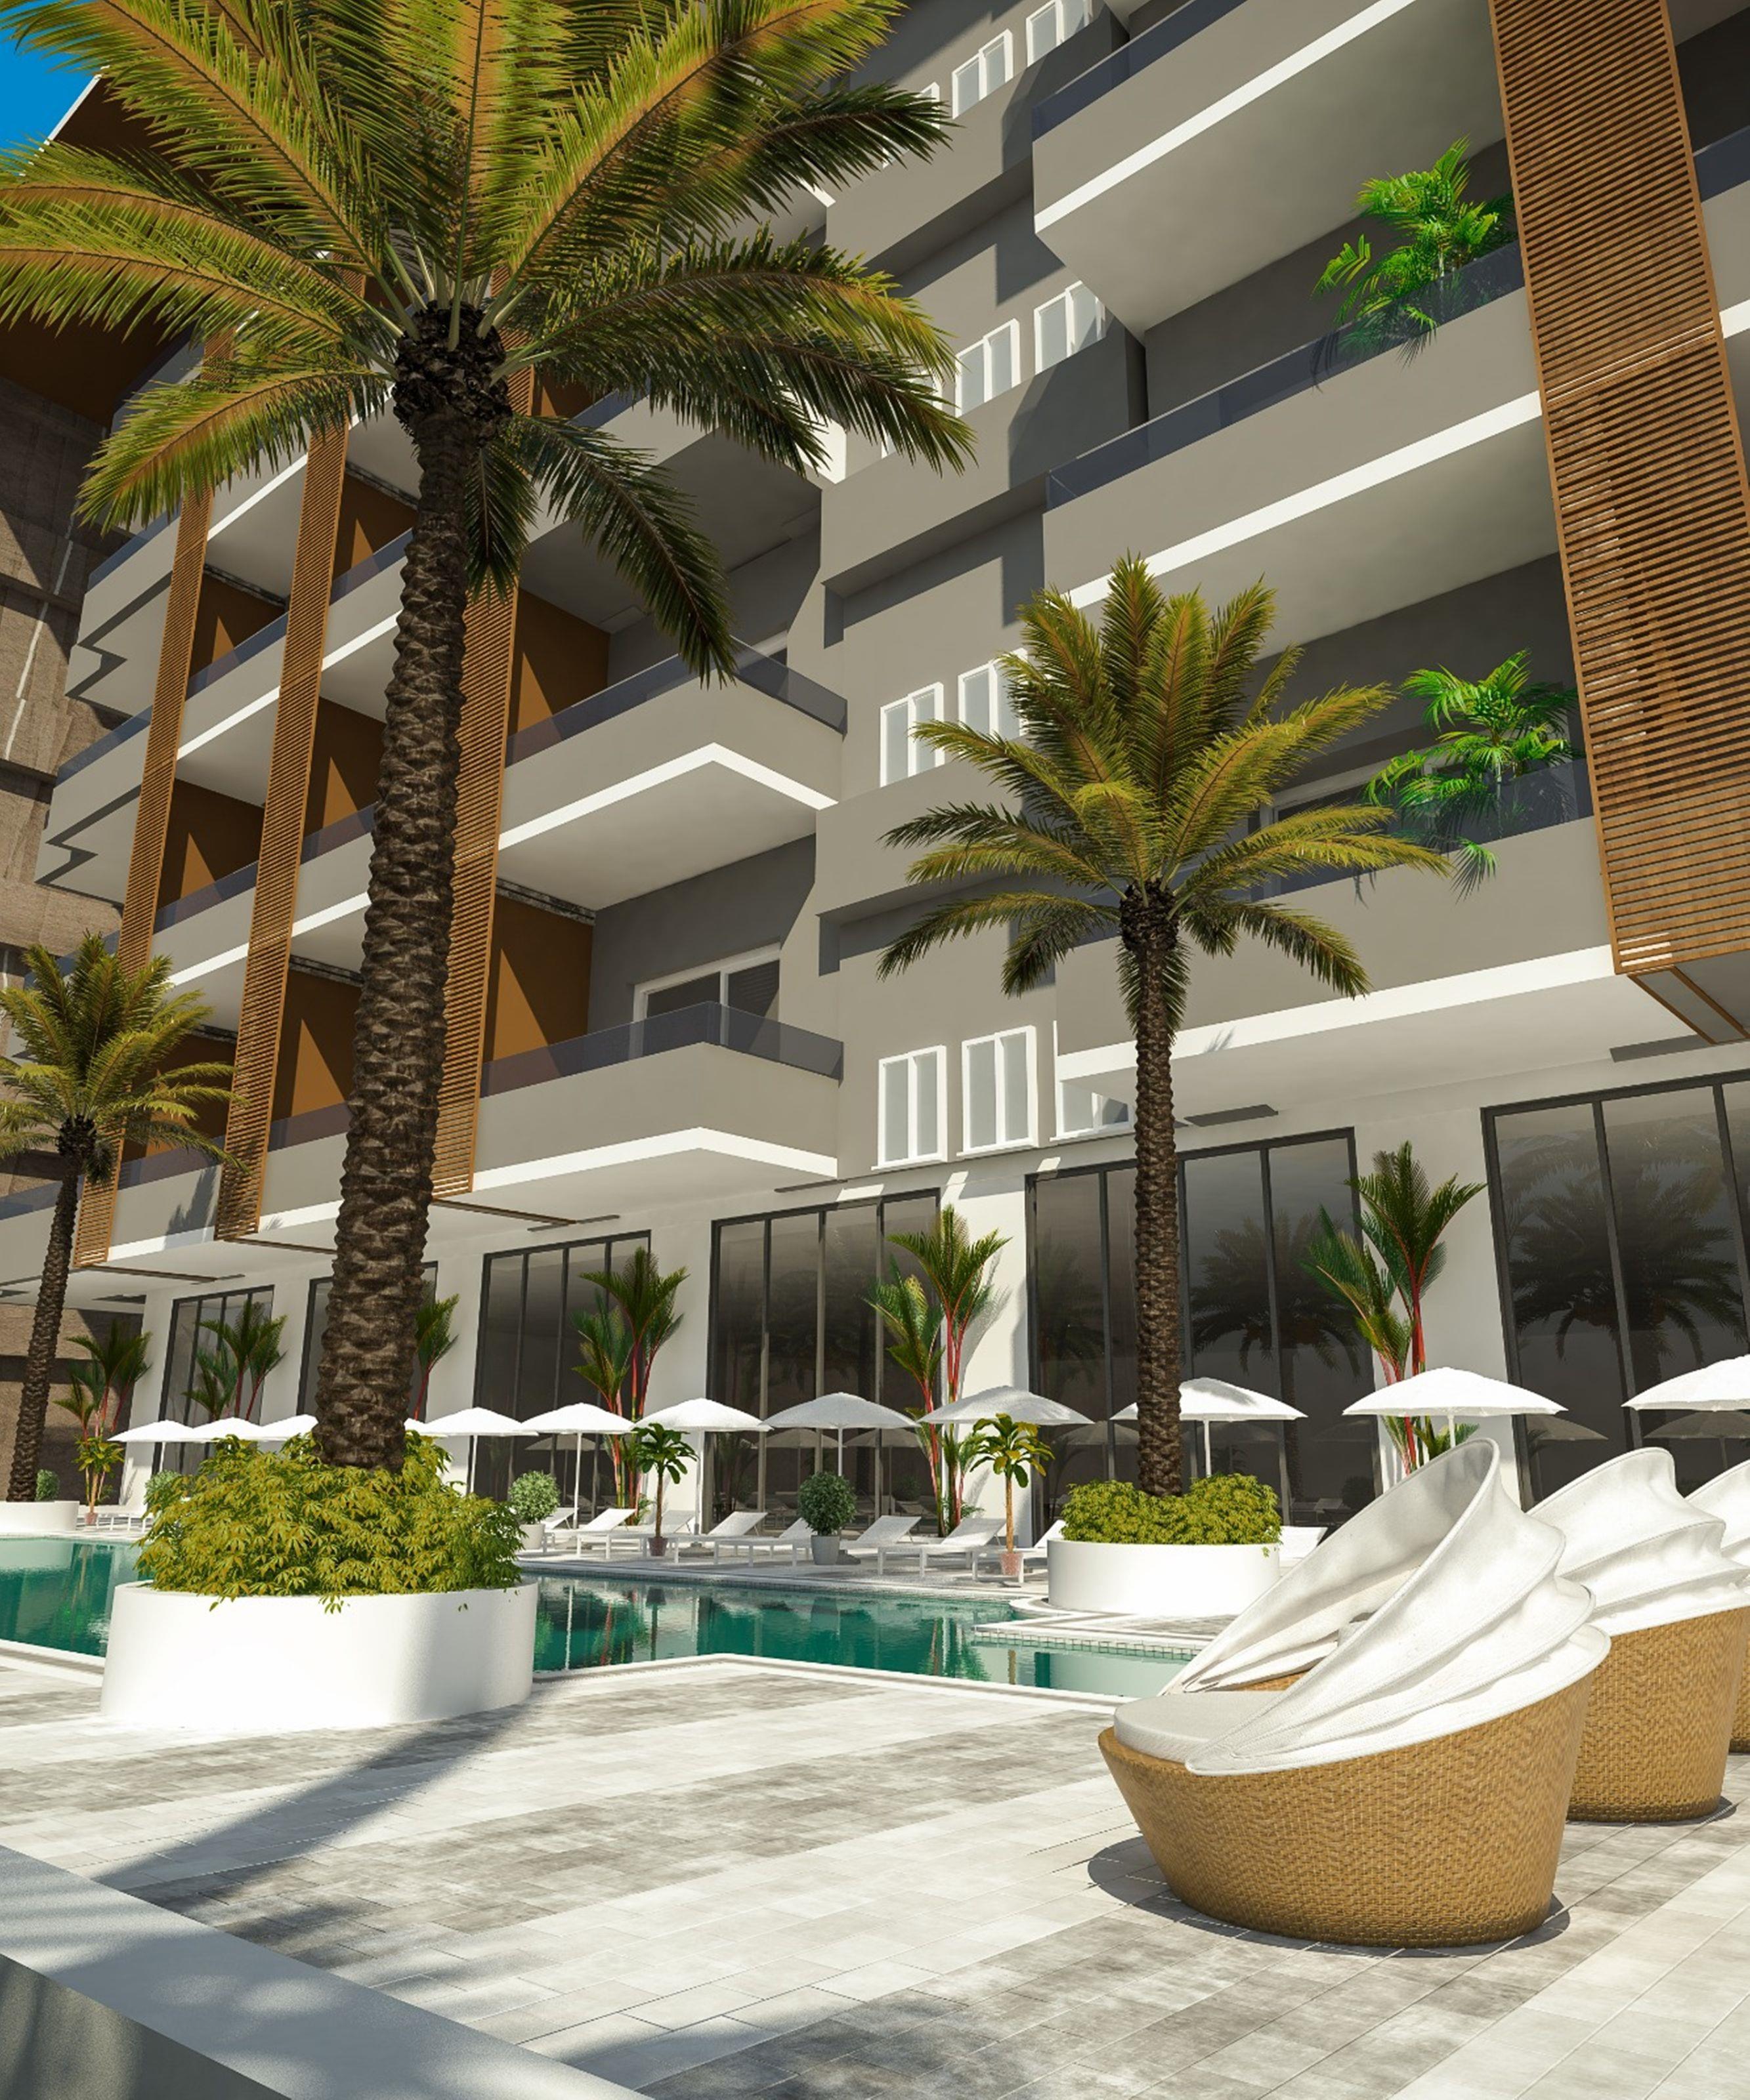 http://www.orextravel.sk/OREX/hotelphotos/anjeliq-downtown-hotel-general-0016.jpg